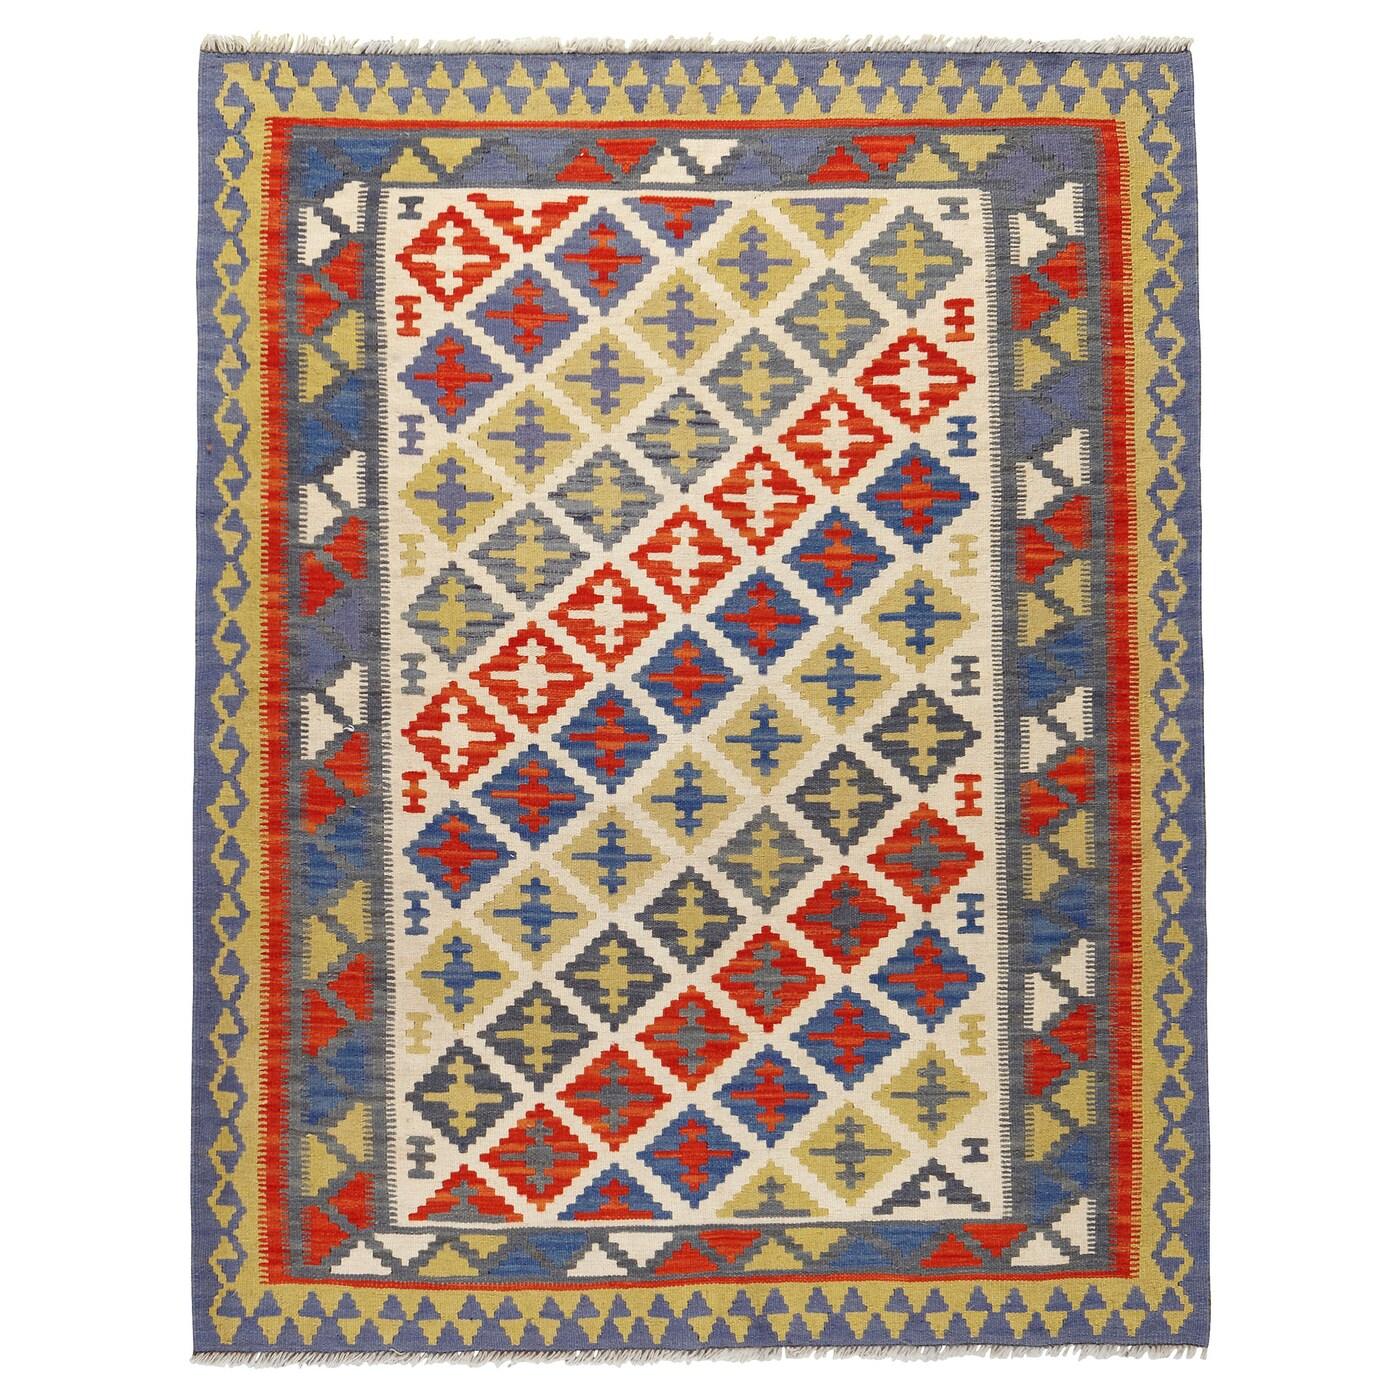 Persisk kelim gashgai teppich flach gewebt  0130084 pe284320 s5